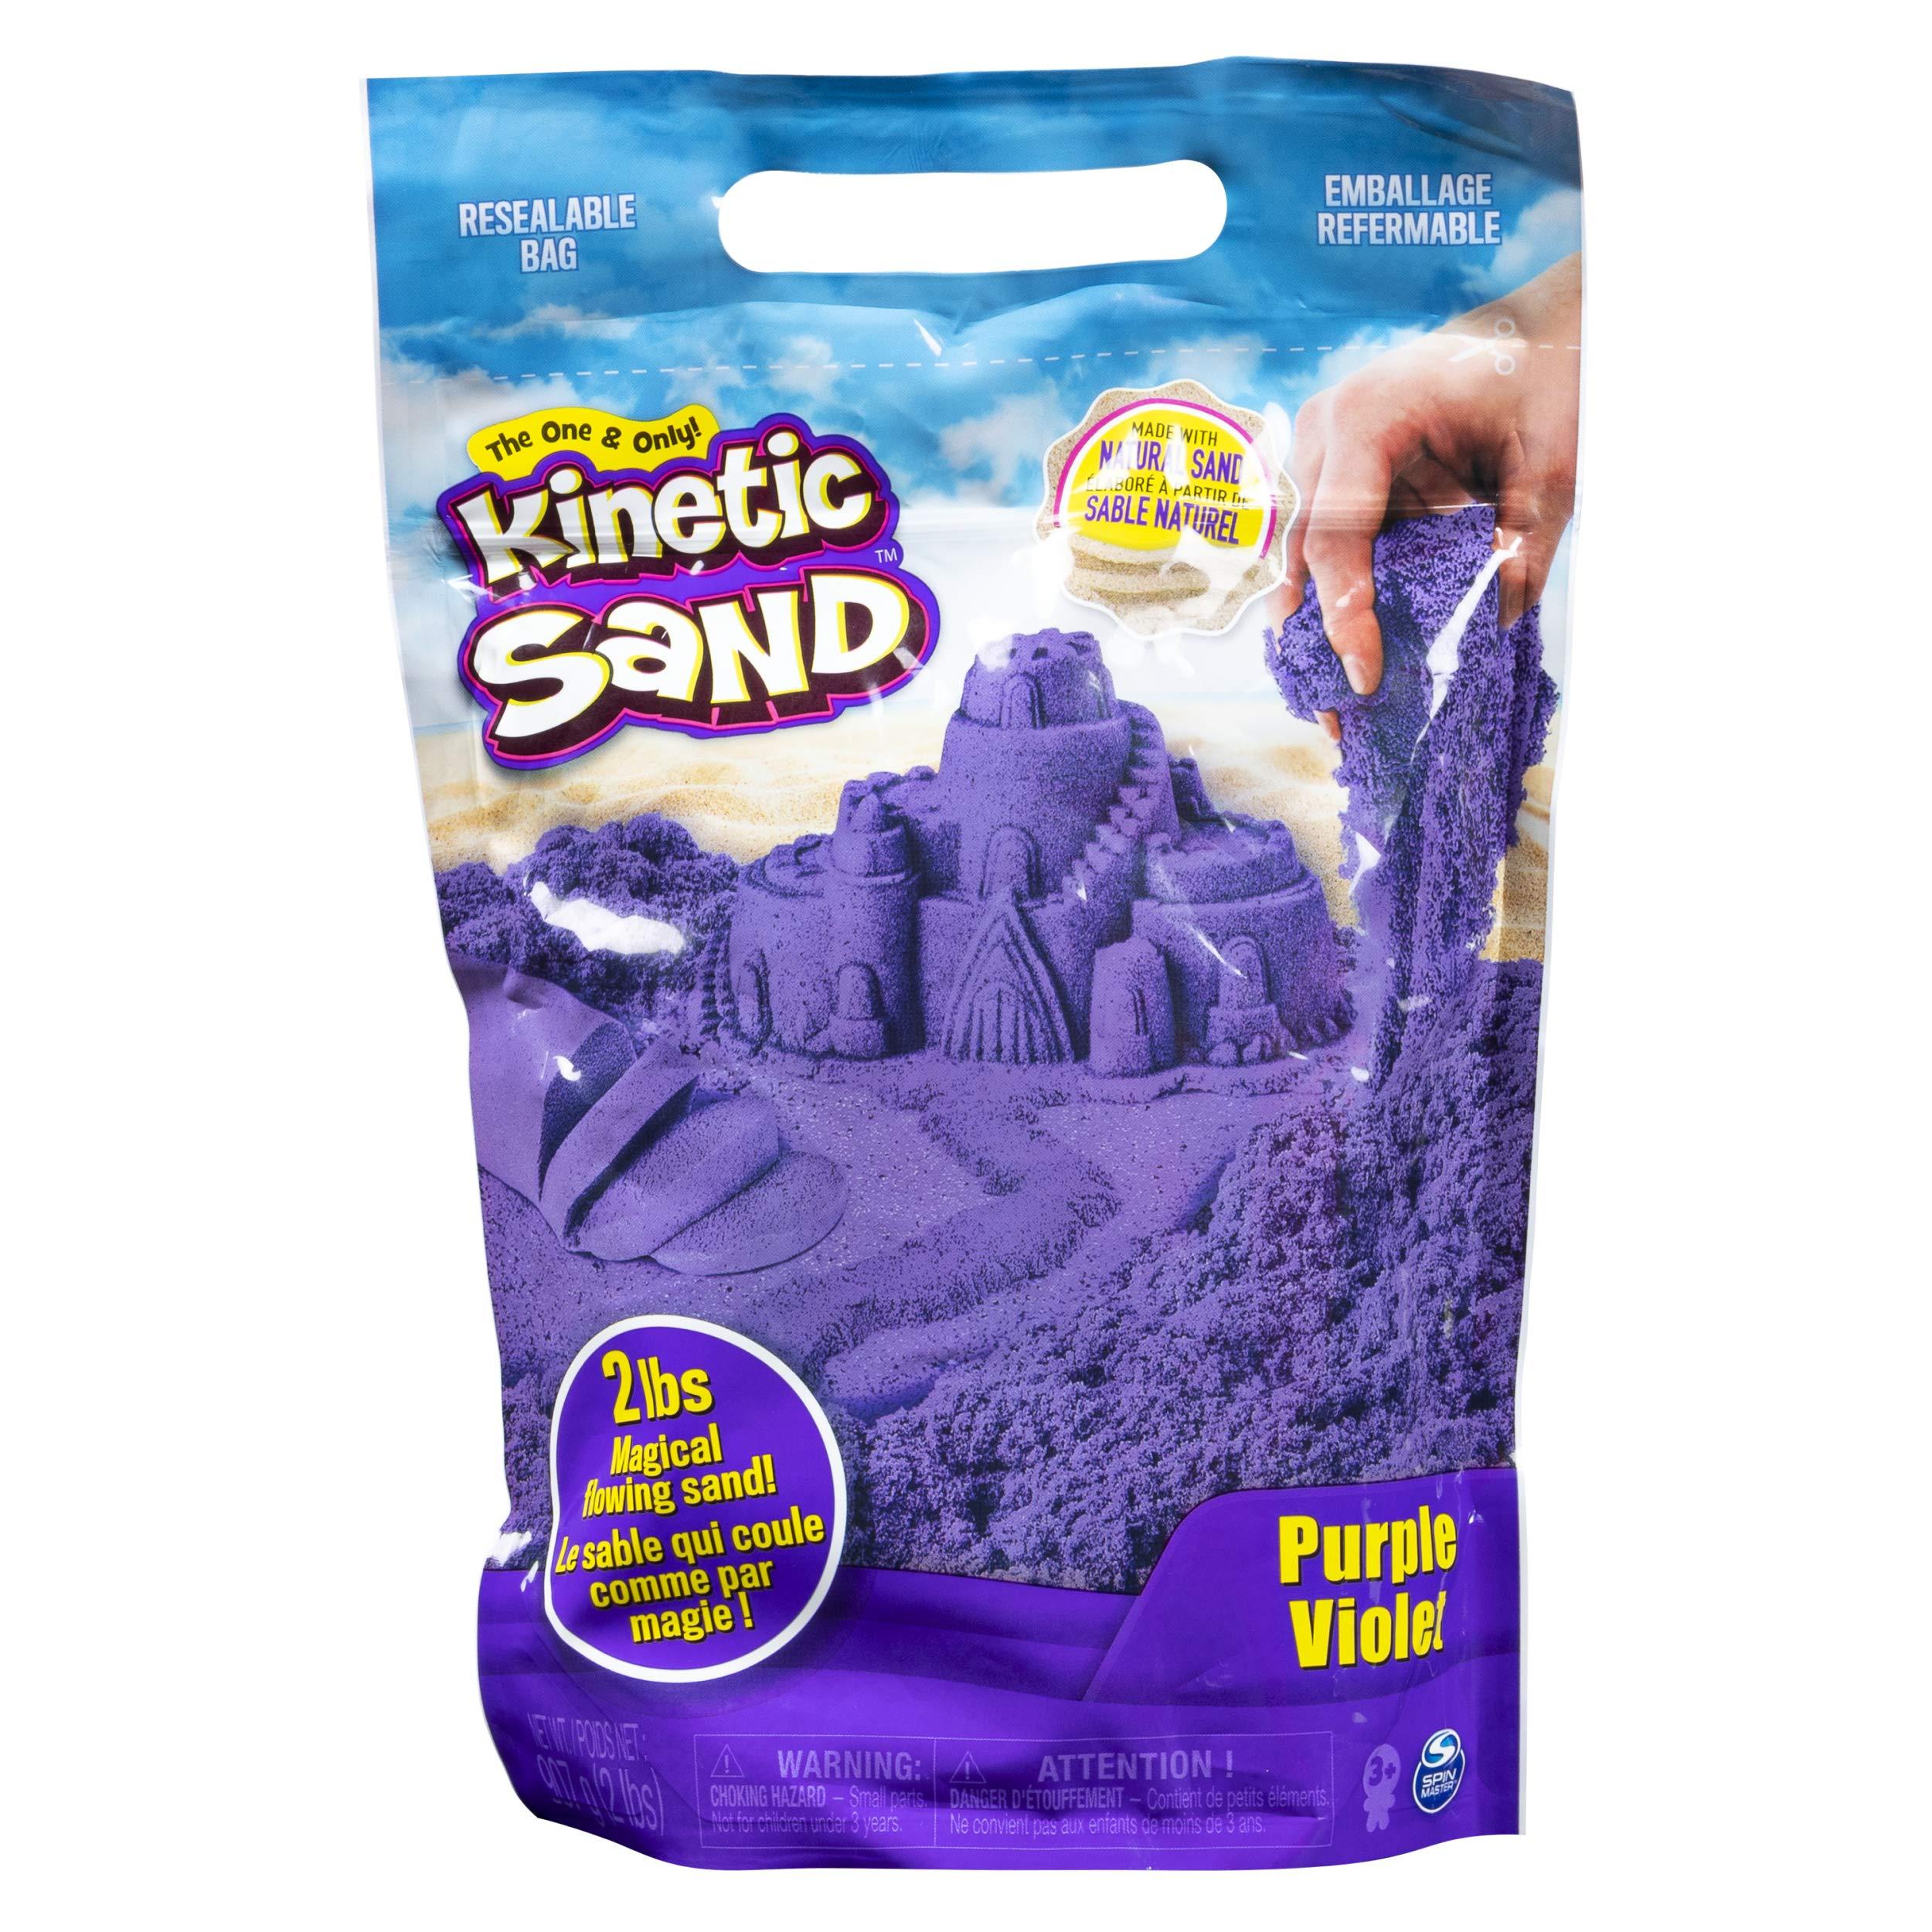 Kinetic Sand The Original Moldable Sensory Play Sand, Purple, 2 Lb by Kinetic Sand